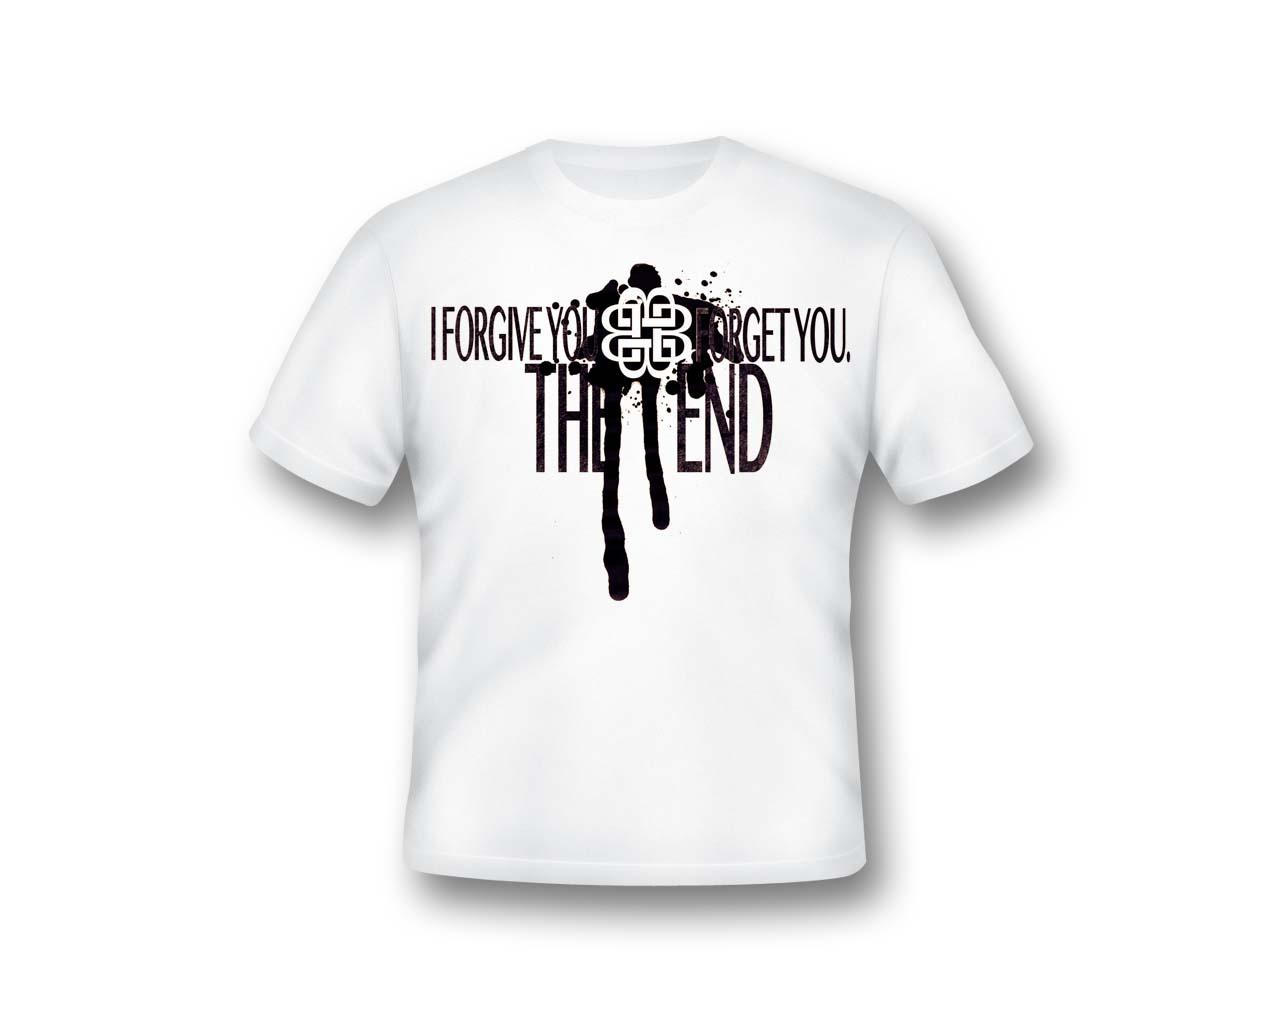 Camelfox's Logo T-Shirts Breaking_benjamin_shirt_design_by_camelfox01-d5r96il